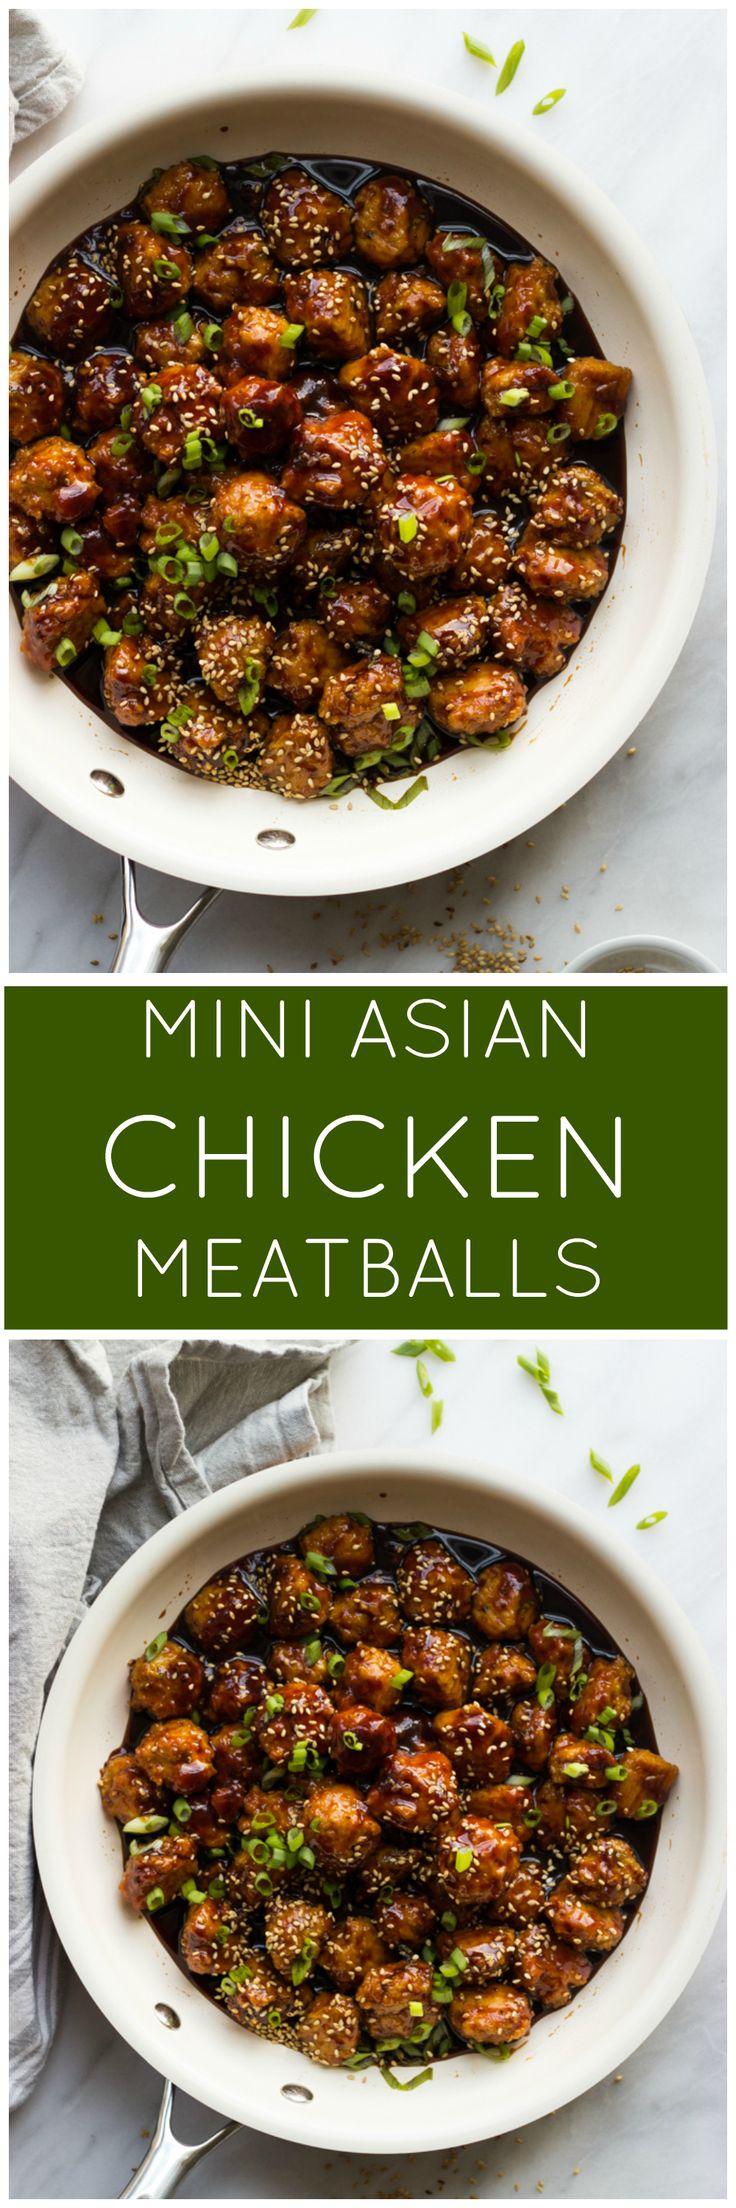 Mini Asian Chicken Meatballs - tender chicken meatballs in a delicious asian inspired sauce. SO good for the holidays! | littlebroken.com @littlebroken